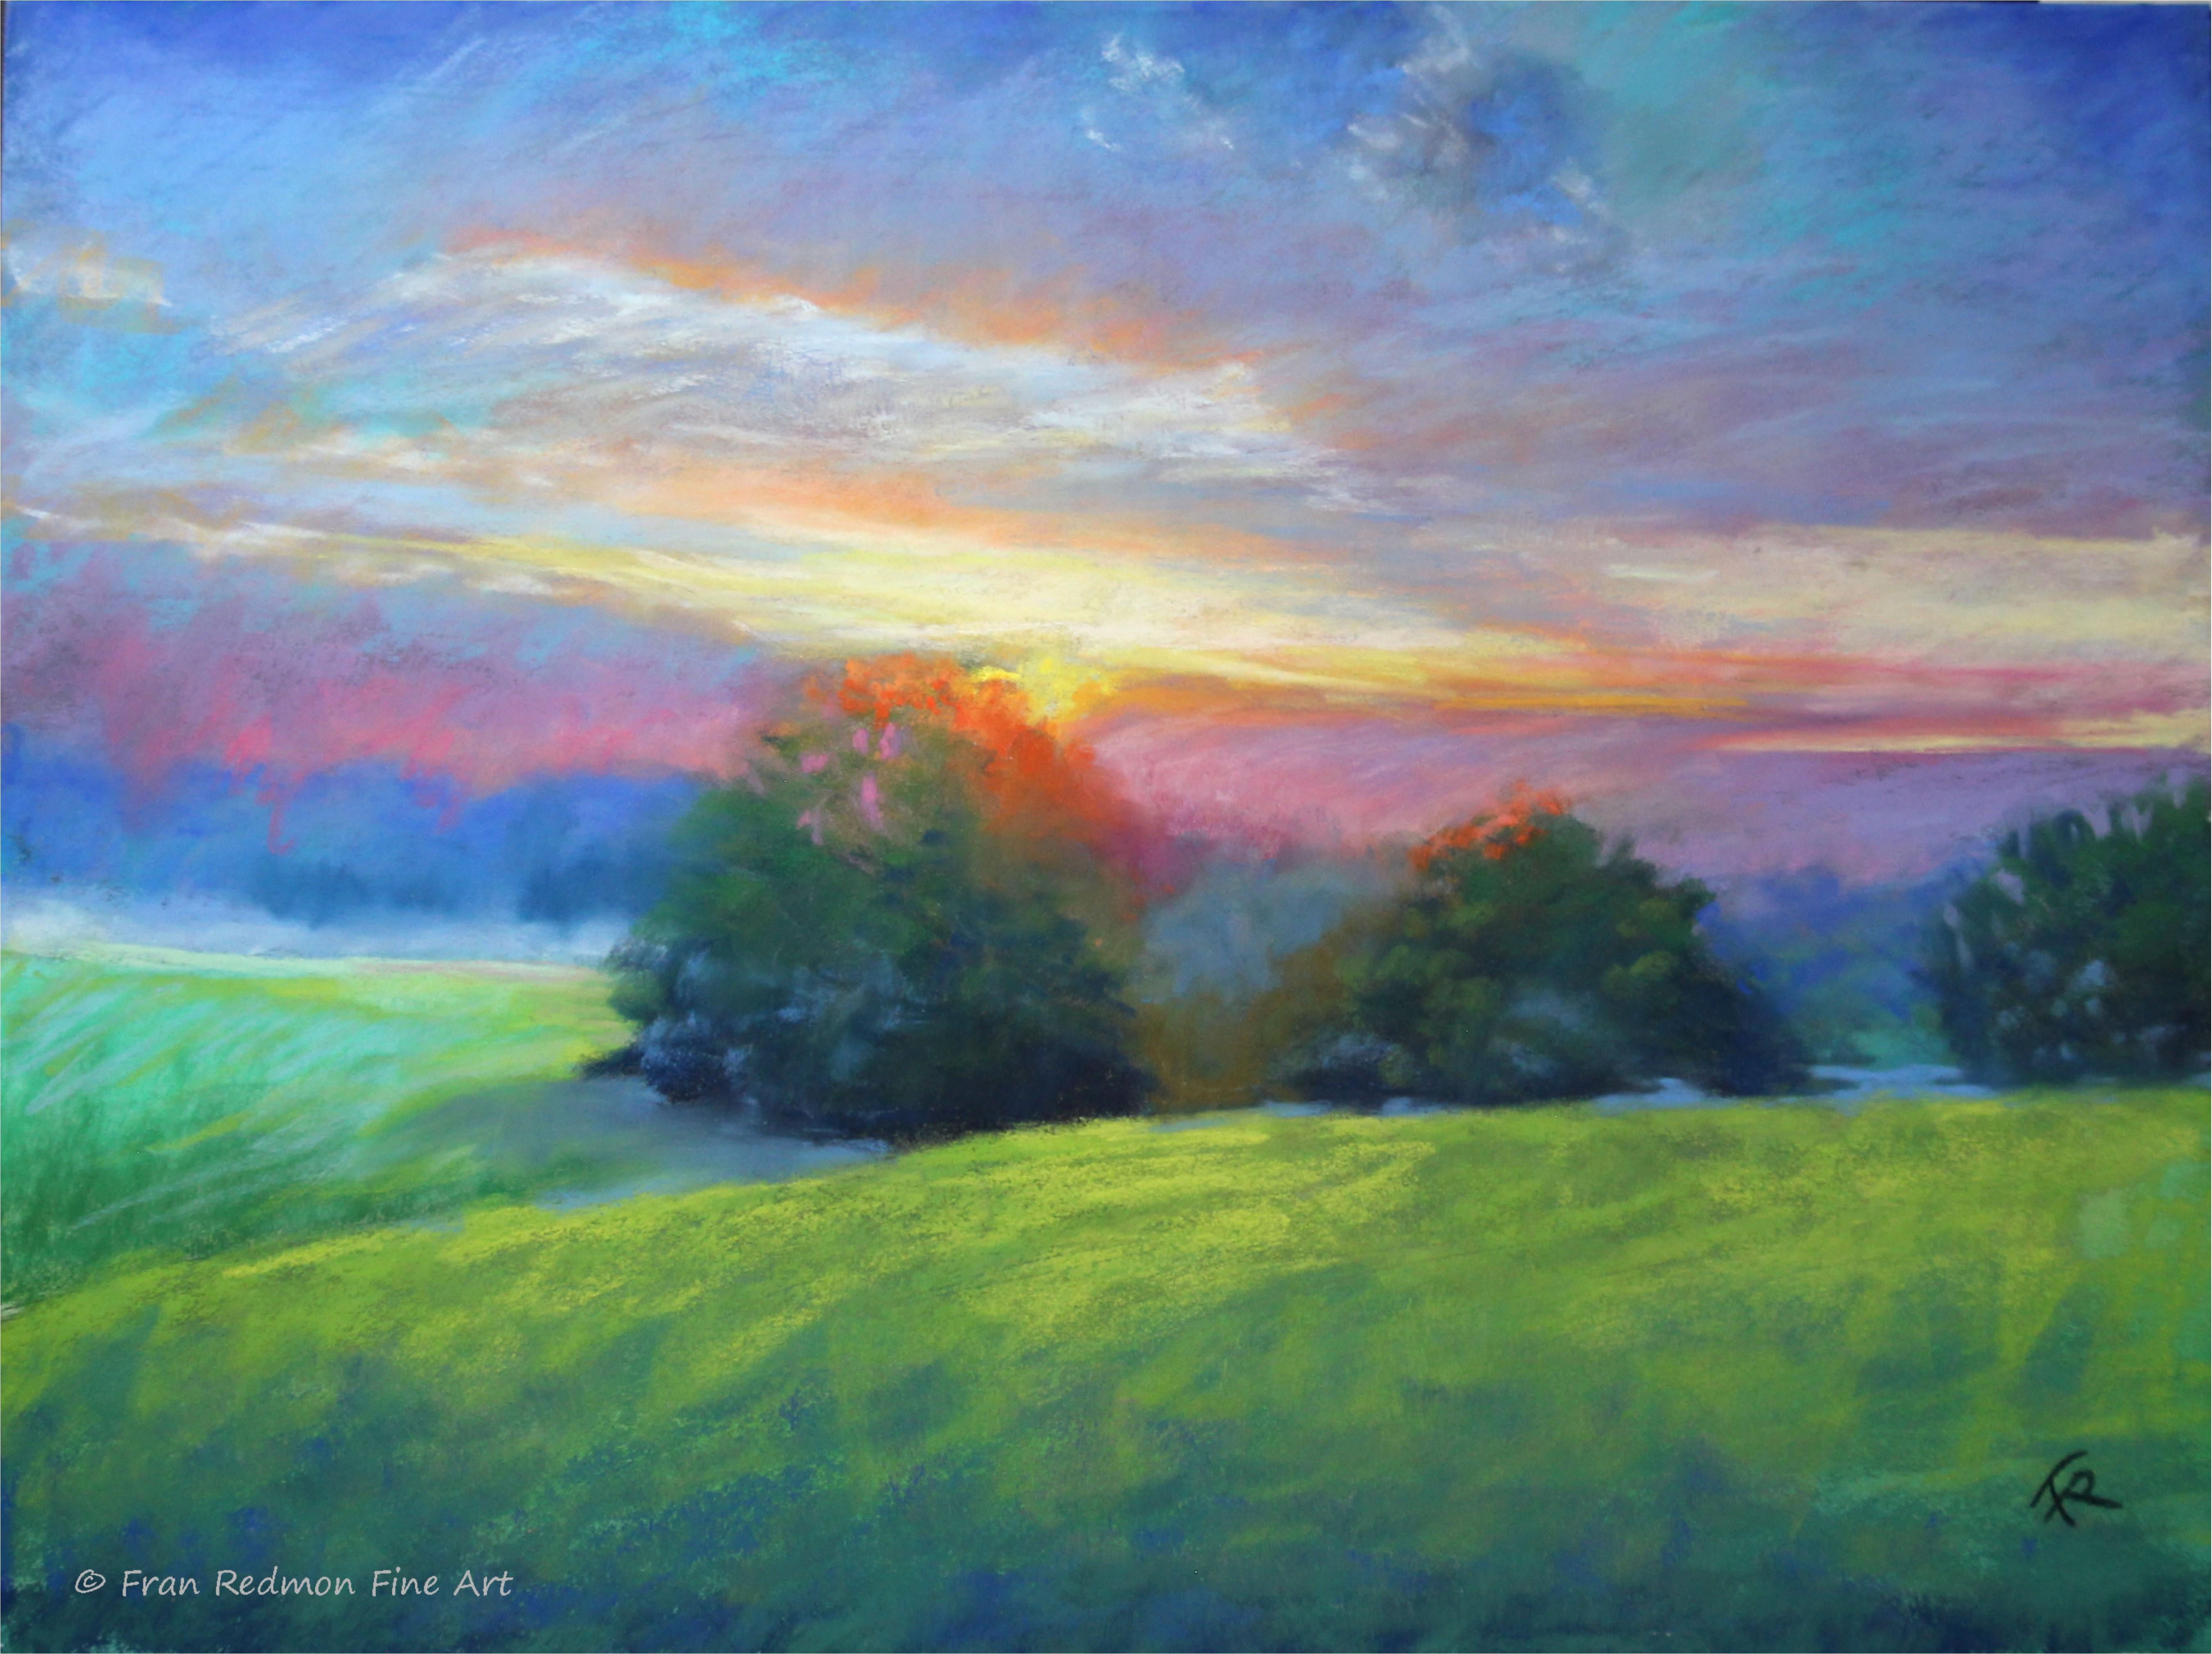 I Dream of Sunsets